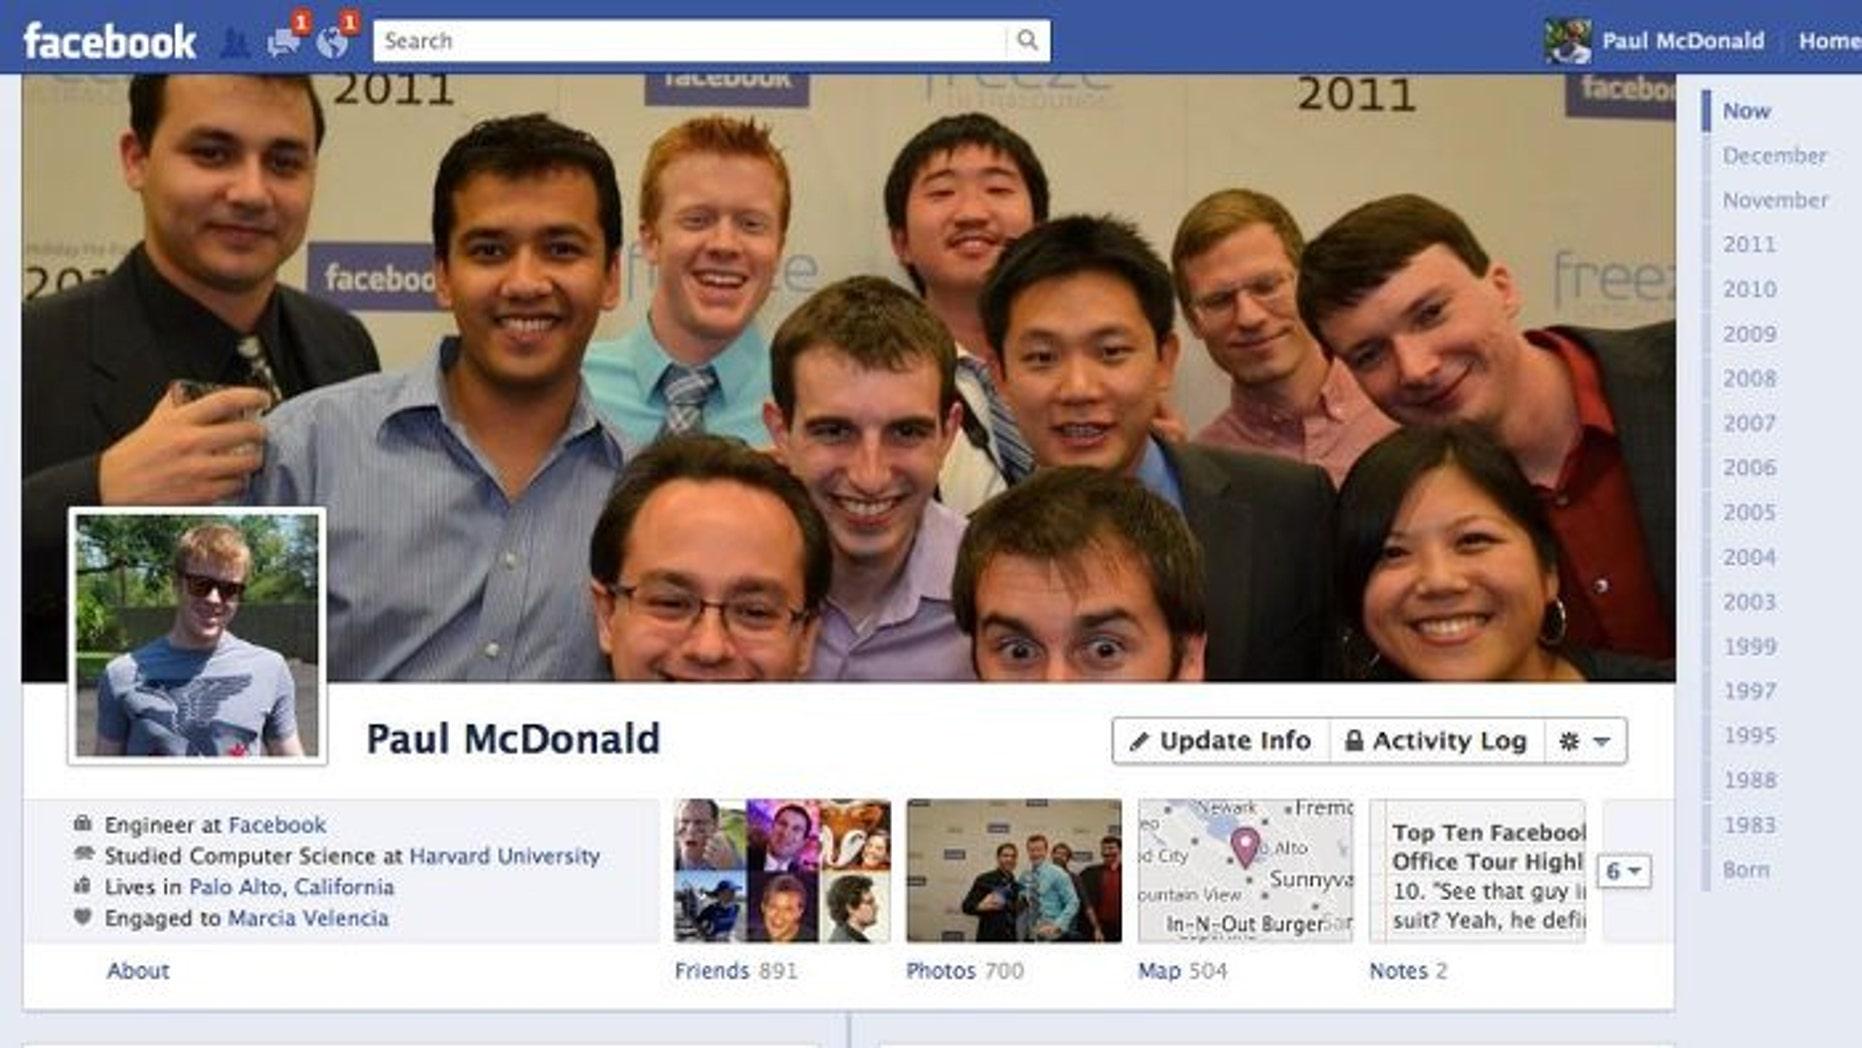 Facebook's biggest makeover to date, called Timeline, went live worldwide in September 2011.